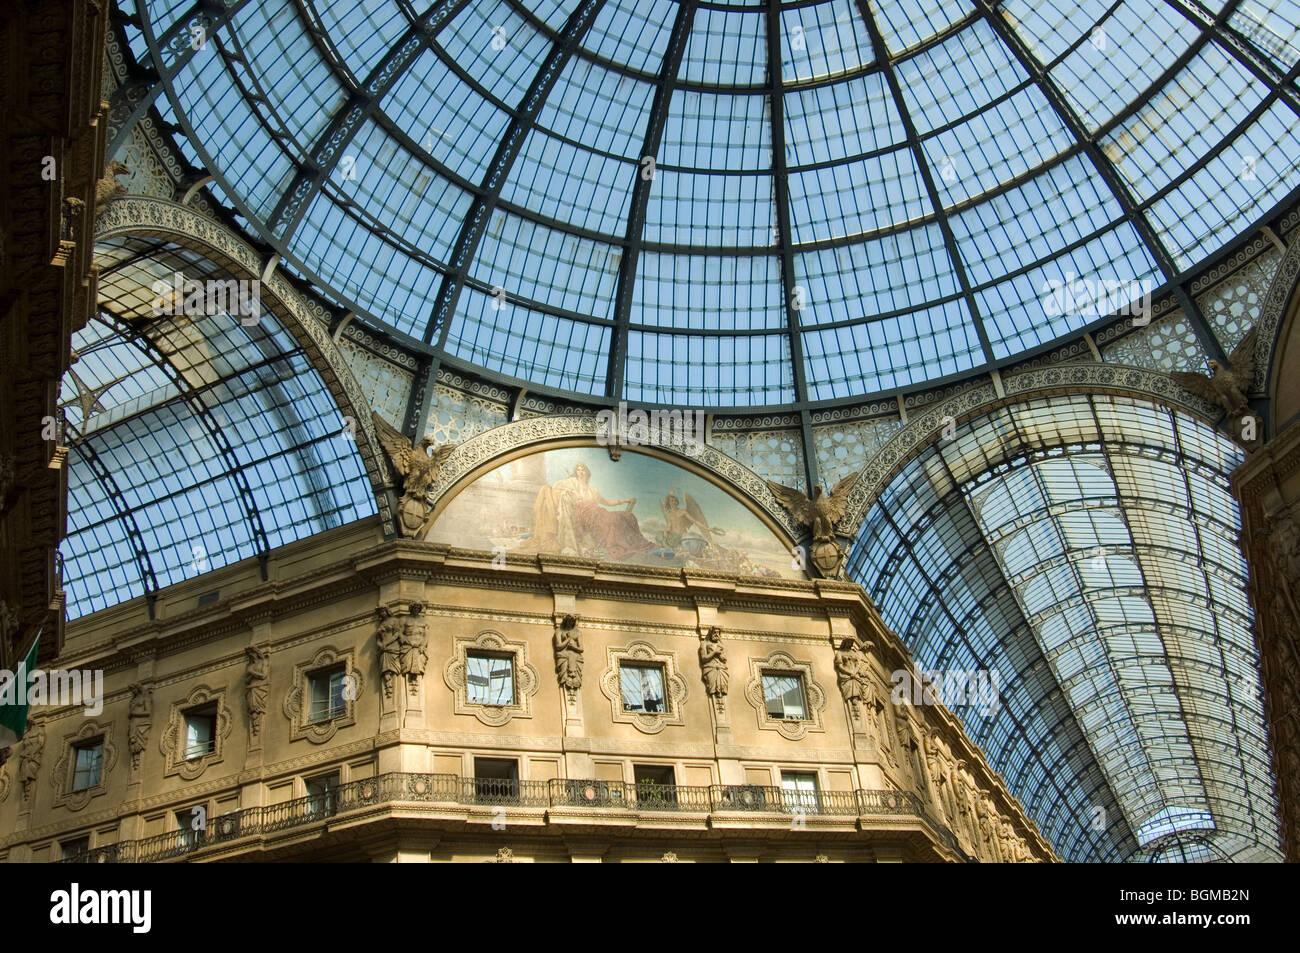 Das Glasdach des Galleria in Mailand Piazza Duomo Stockbild